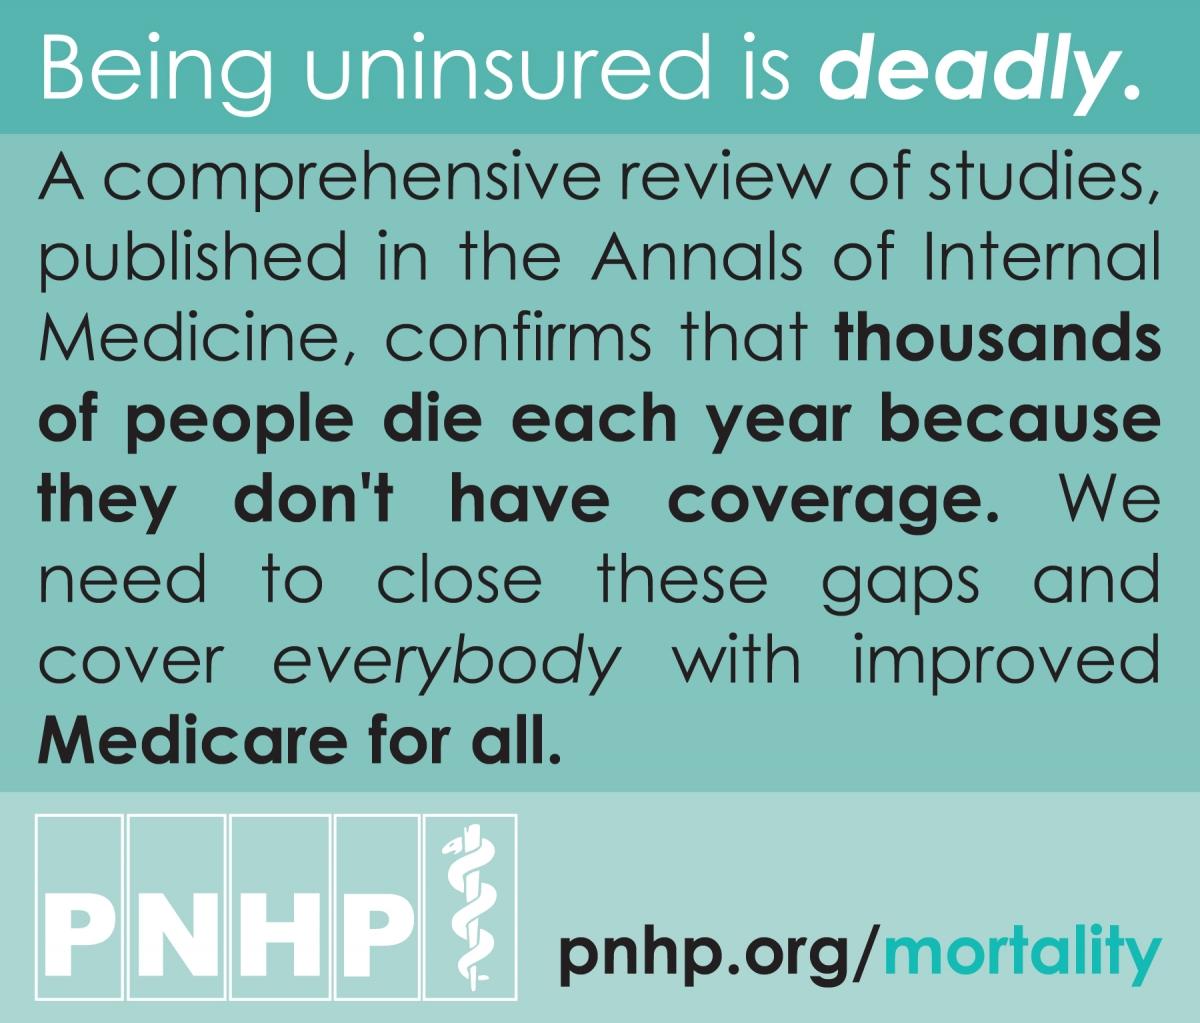 Lack of health insurance and U.S. mortality